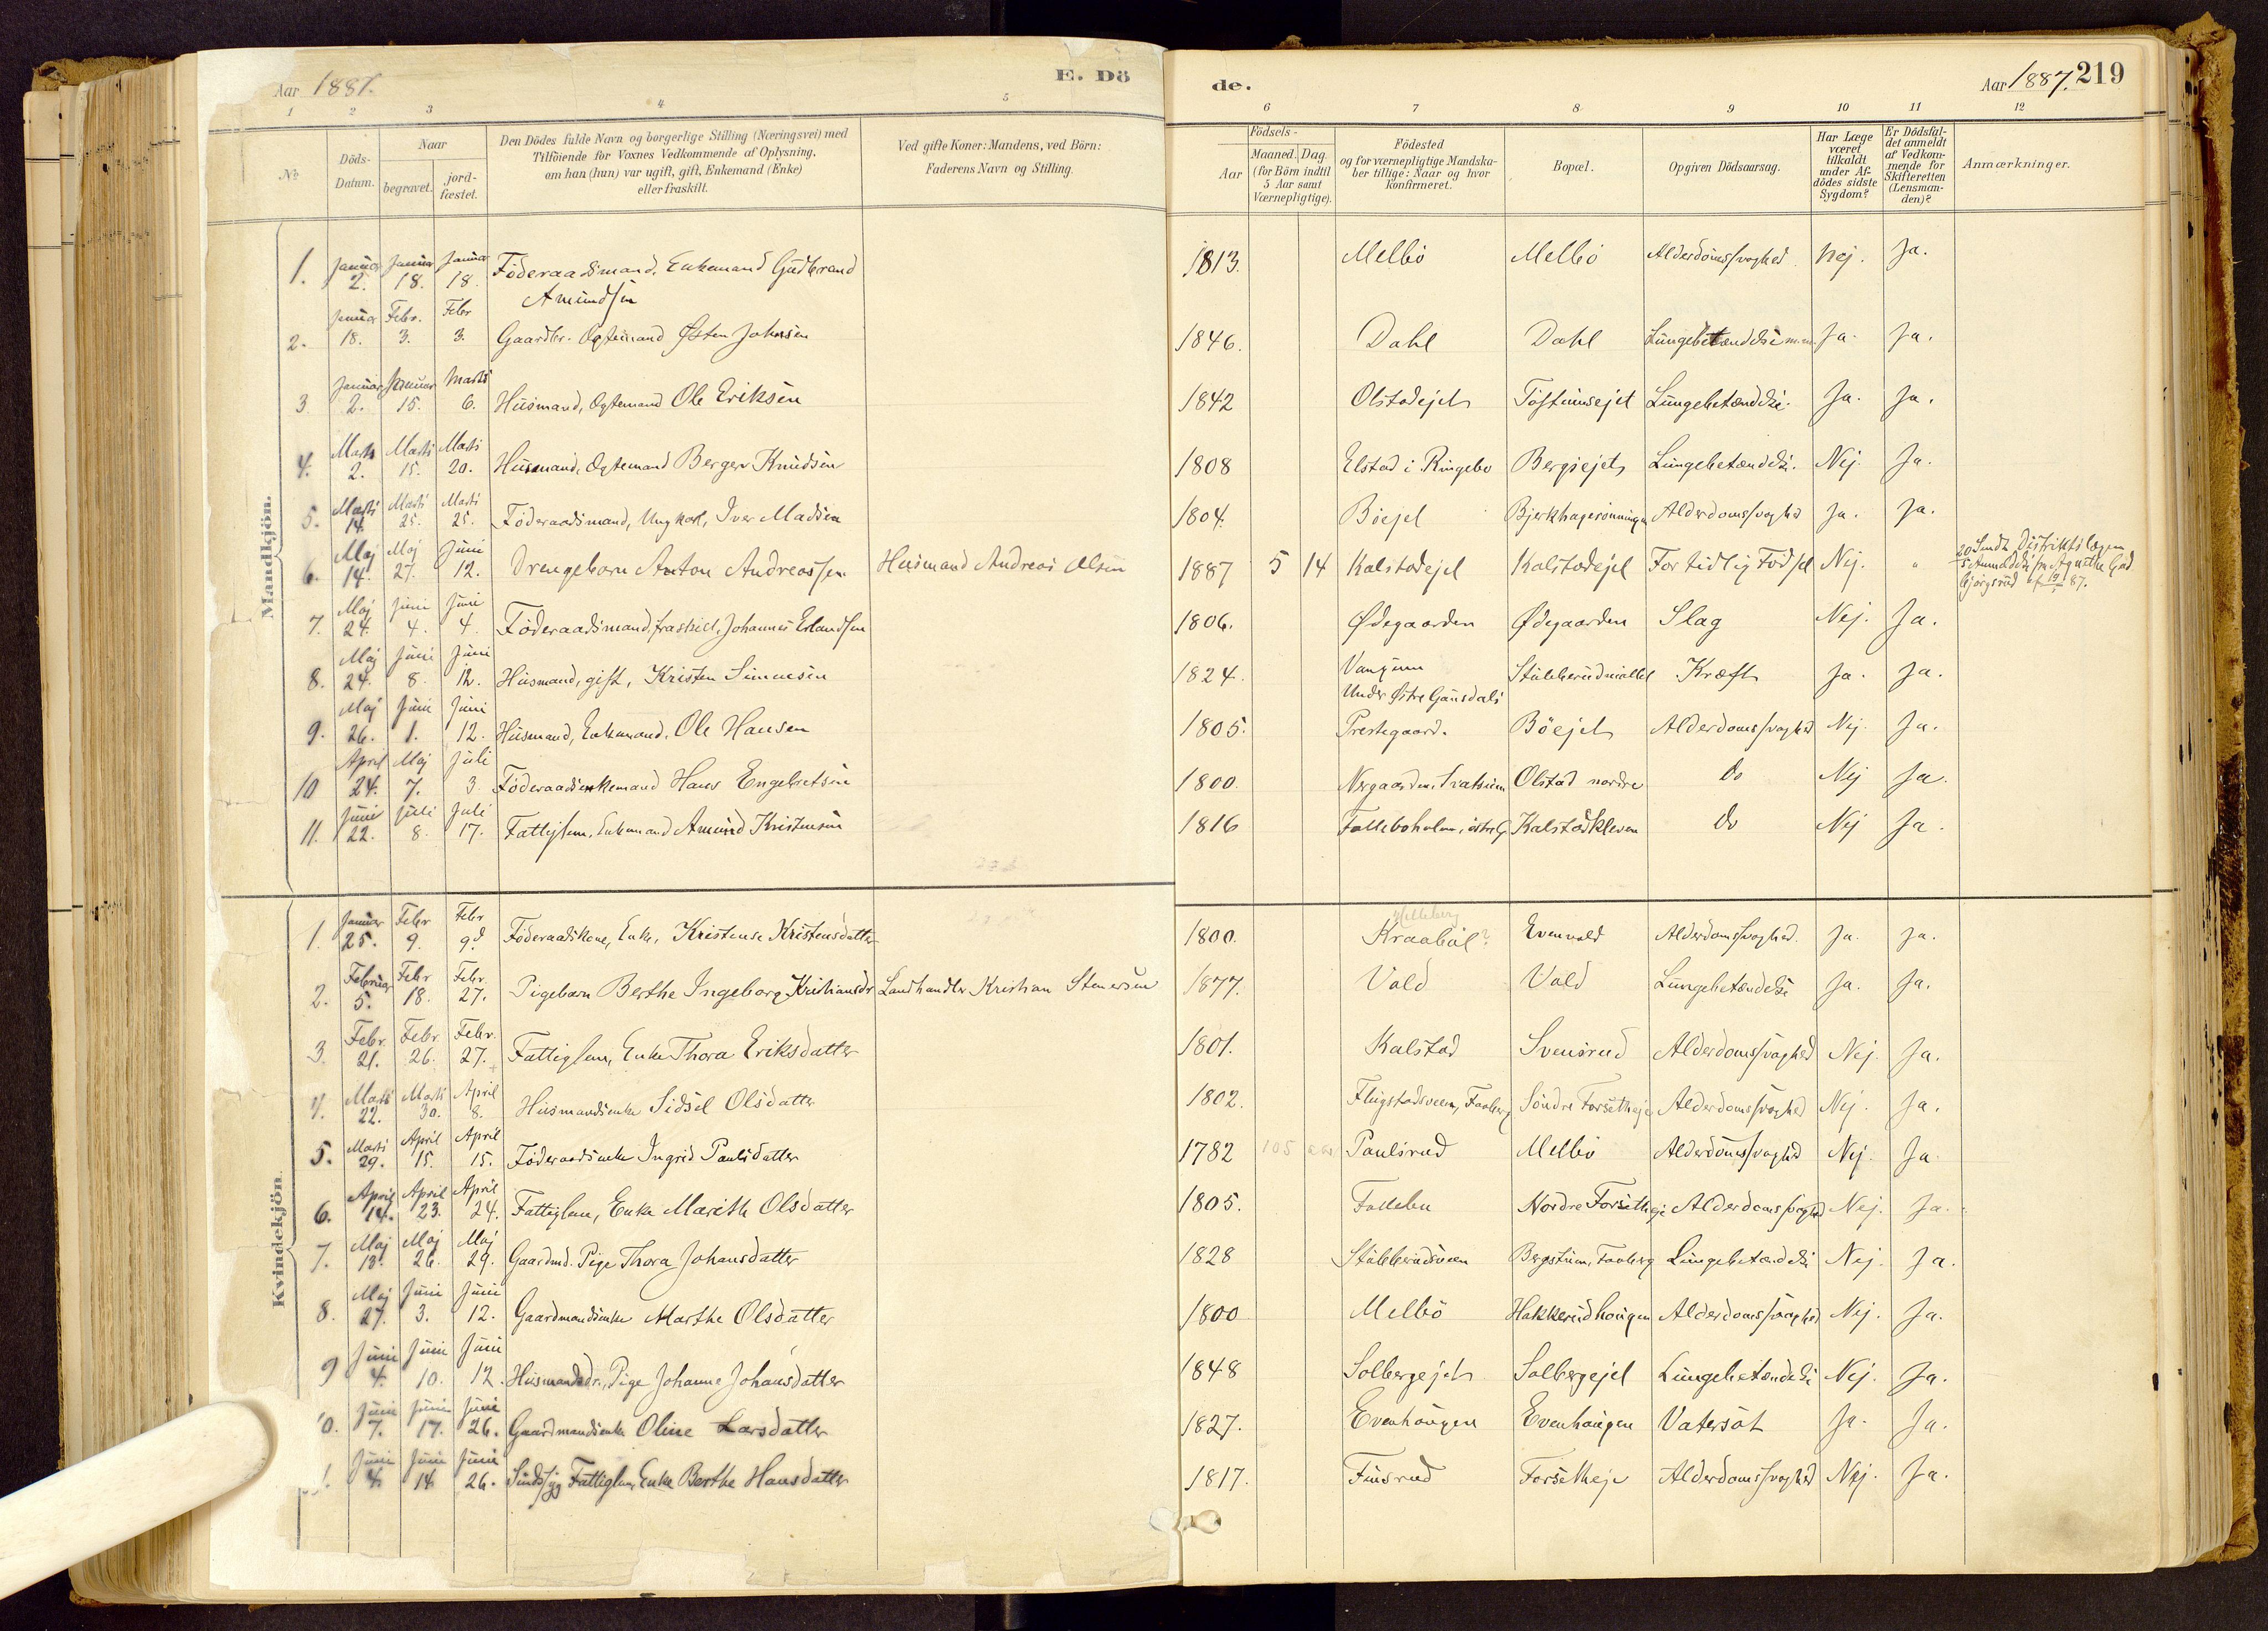 SAH, Vestre Gausdal prestekontor, Ministerialbok nr. 1, 1887-1914, s. 219